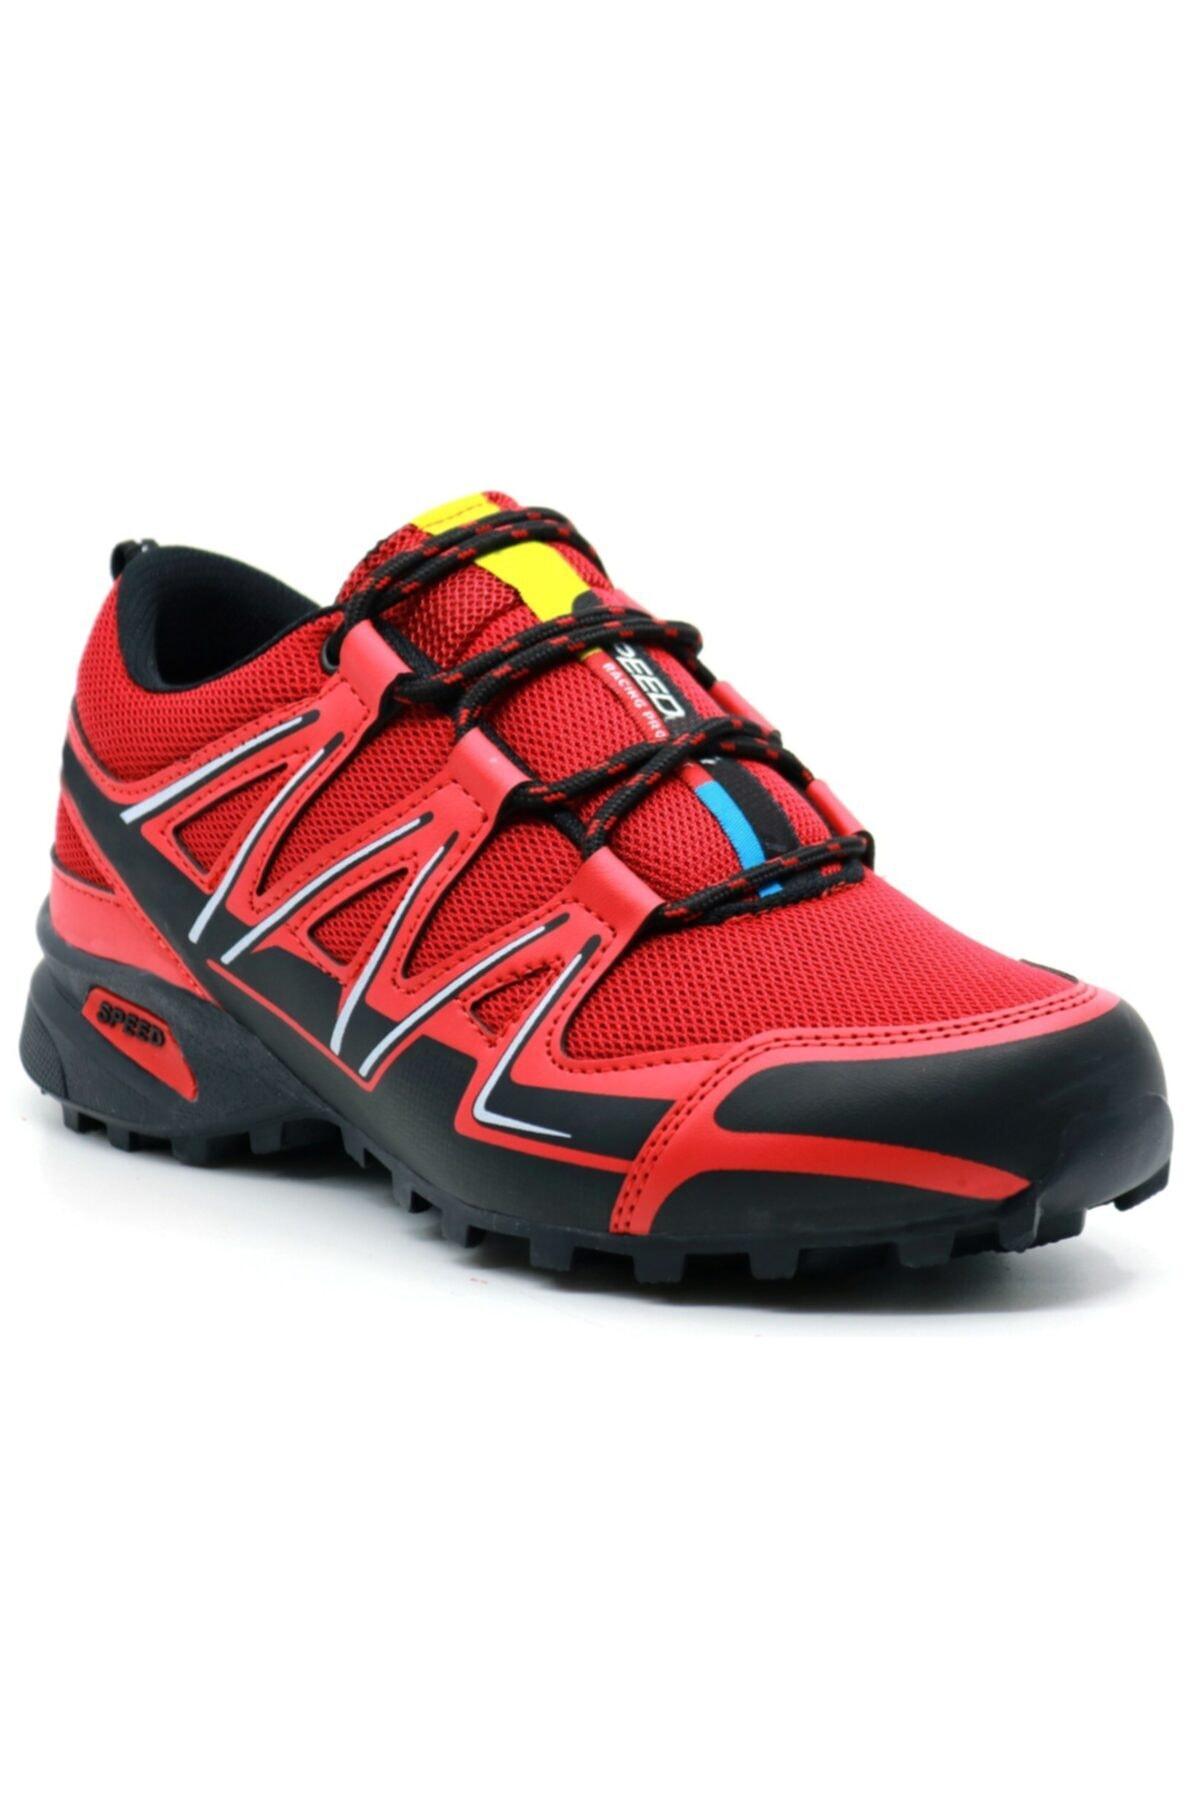 کفش کوهنوردی مردانه مجلسی مارک Ayakkabix رنگ قرمز ty63809788